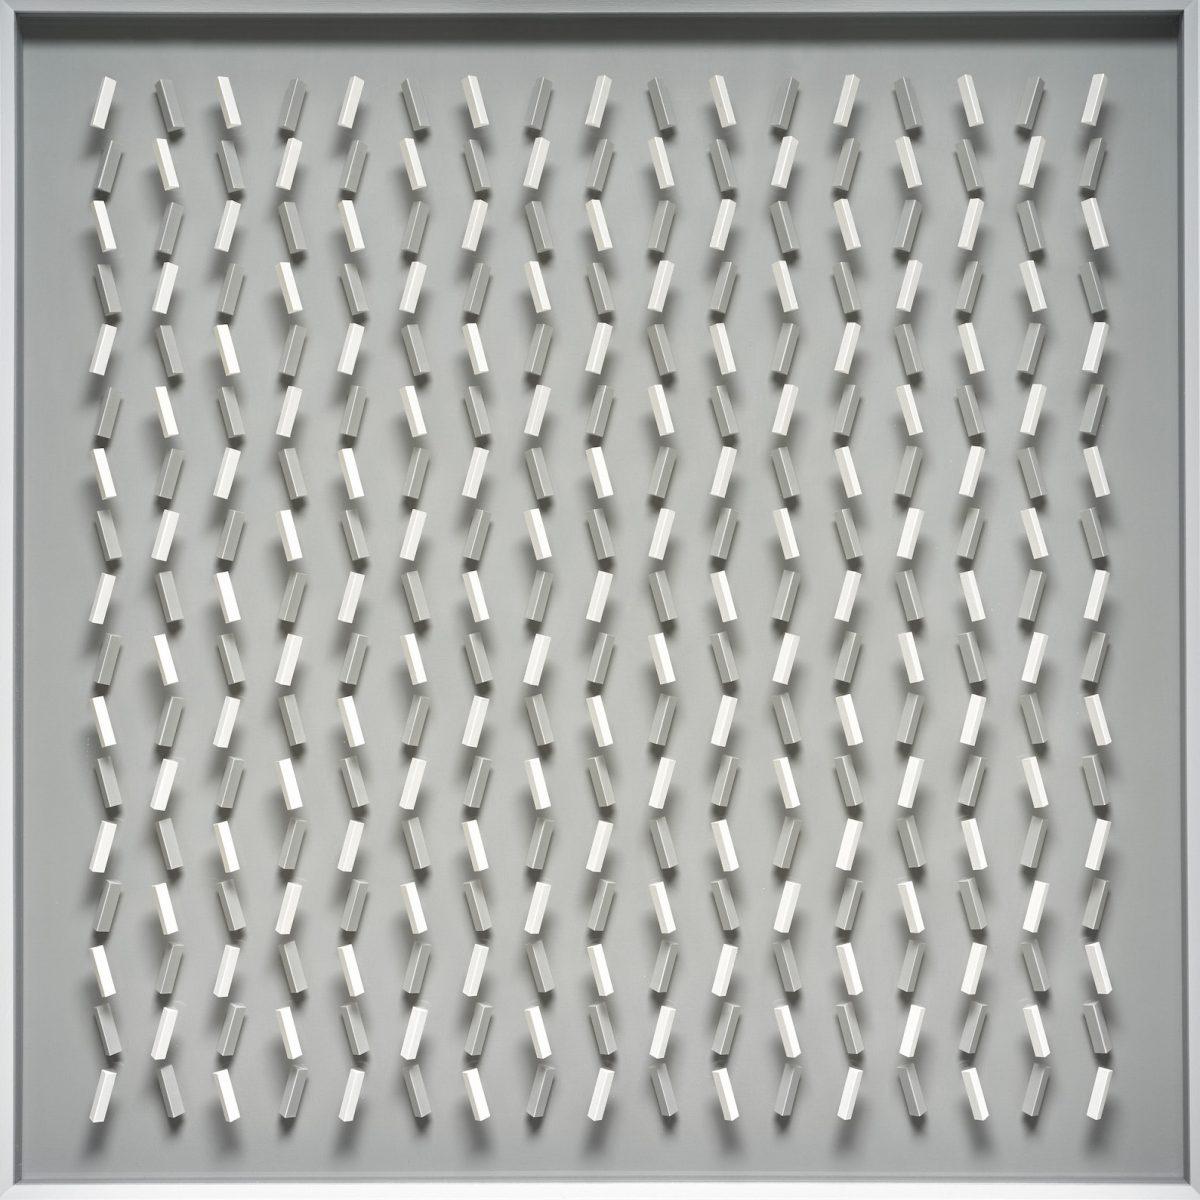 04 Klaus Staudt, example for, 2017, 85 x 85 x 7,5cm, Holz, Acrylfarbe, Acrylglas grau; Foto: Norbert Miguletz